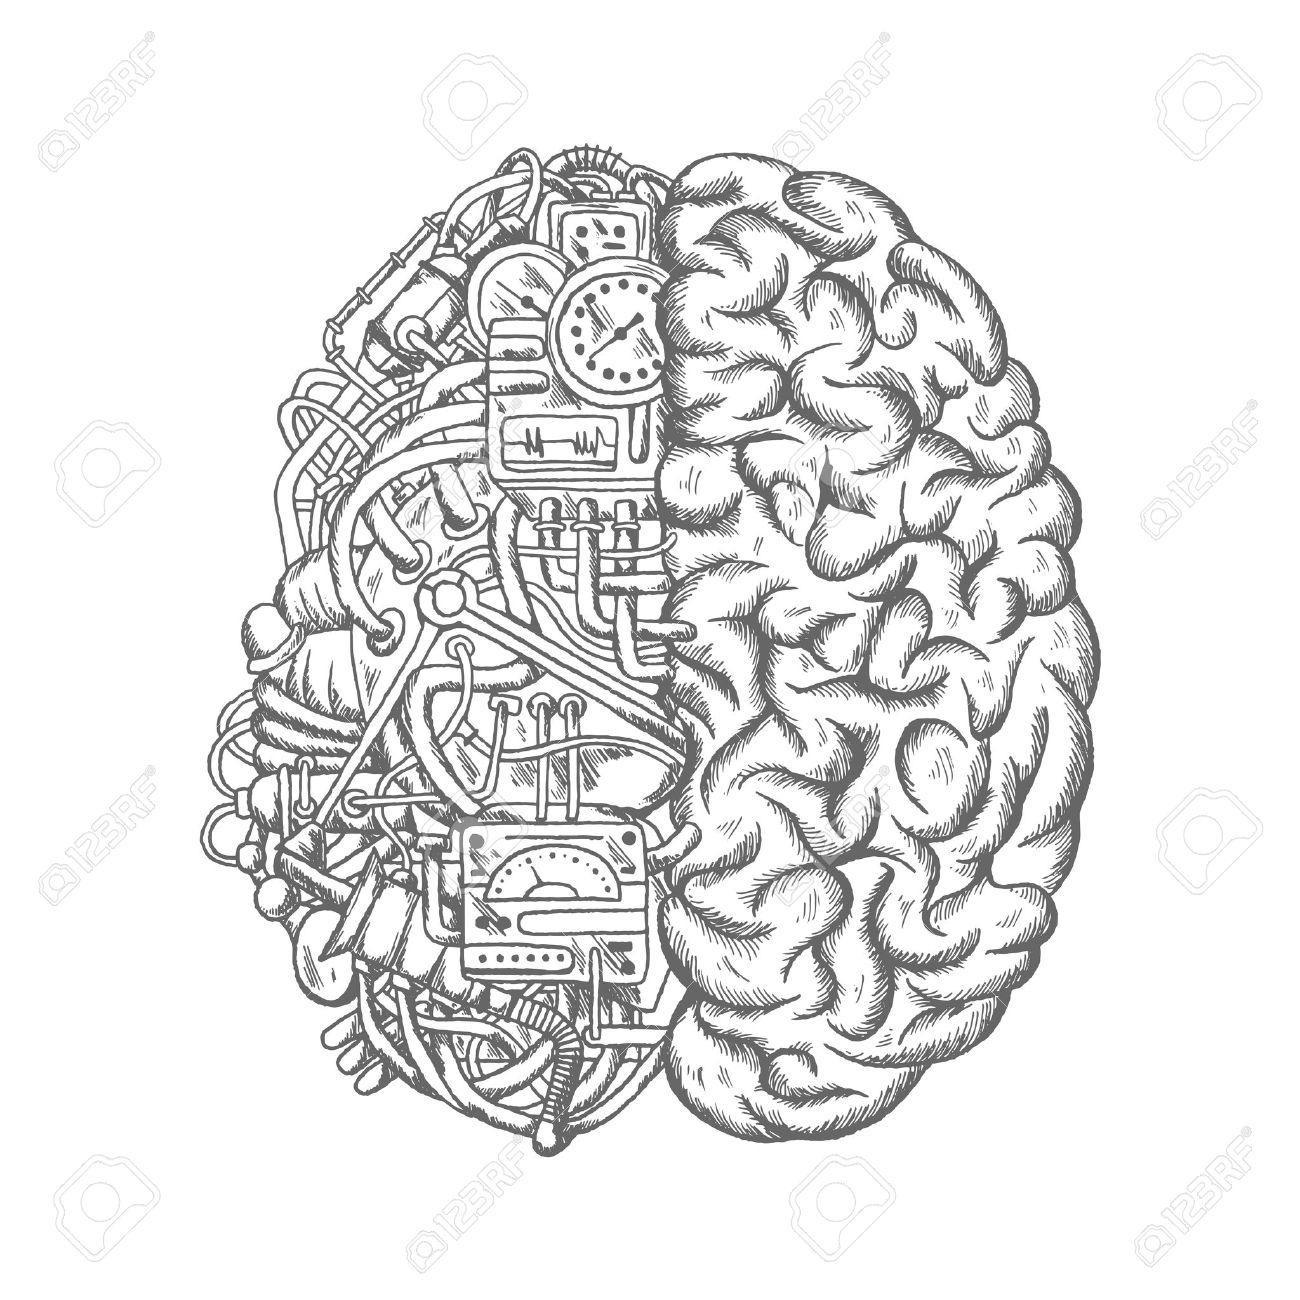 1300x1300 Brain Mechanism Sketch Vector Icon. Human Brain Half Of Machine